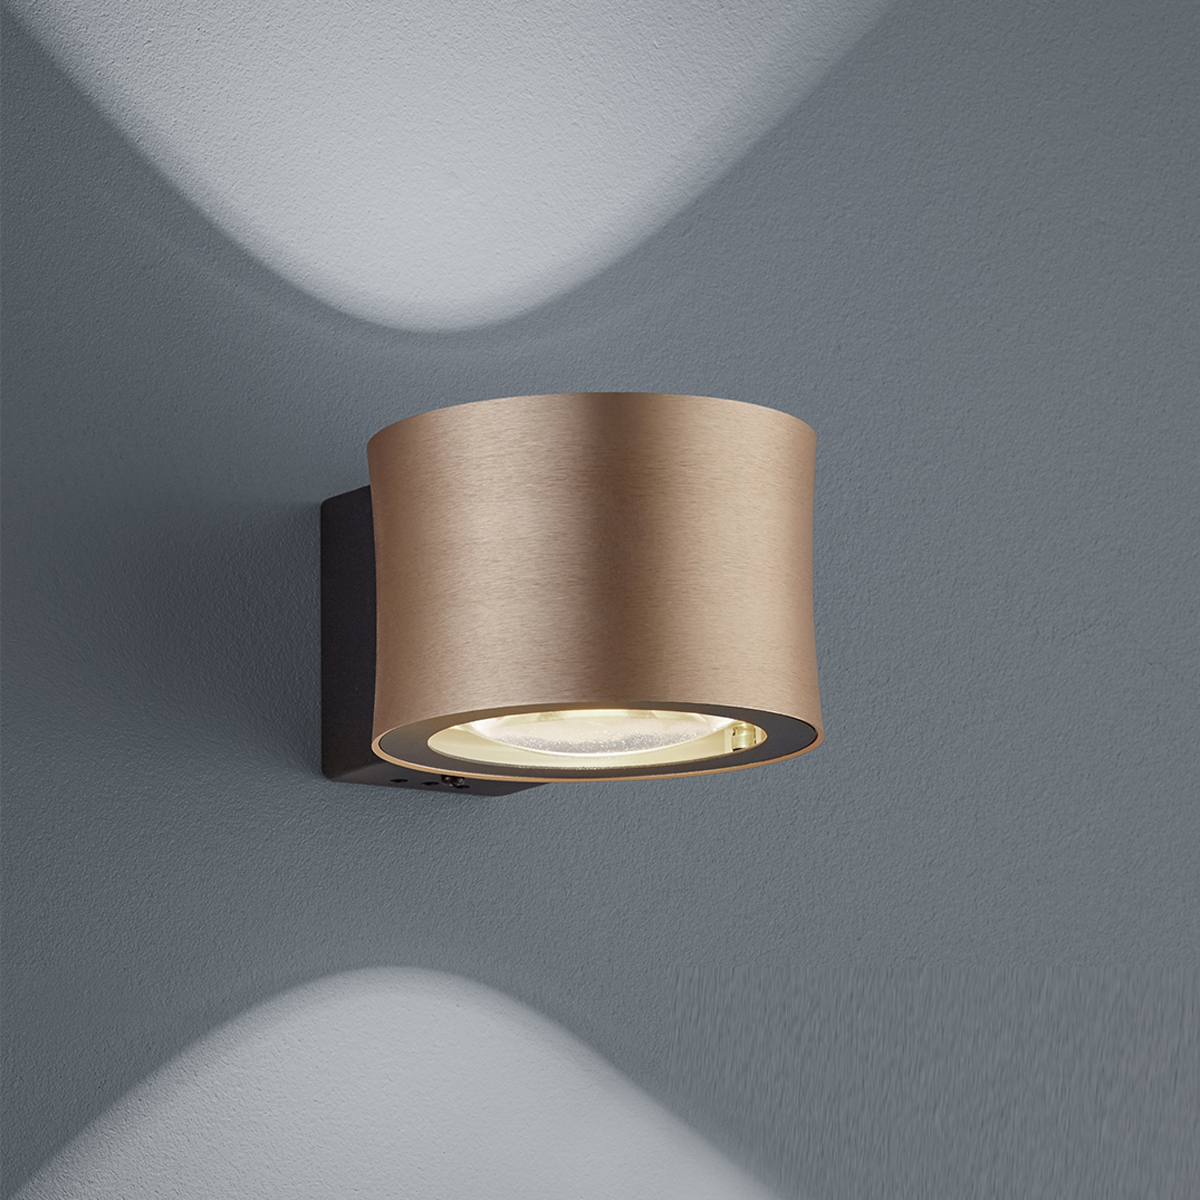 LED-Wandleuchten von BANKAMP Leuchtenmanufaktur LED-Wandleuchte Impulse 4325/1-74